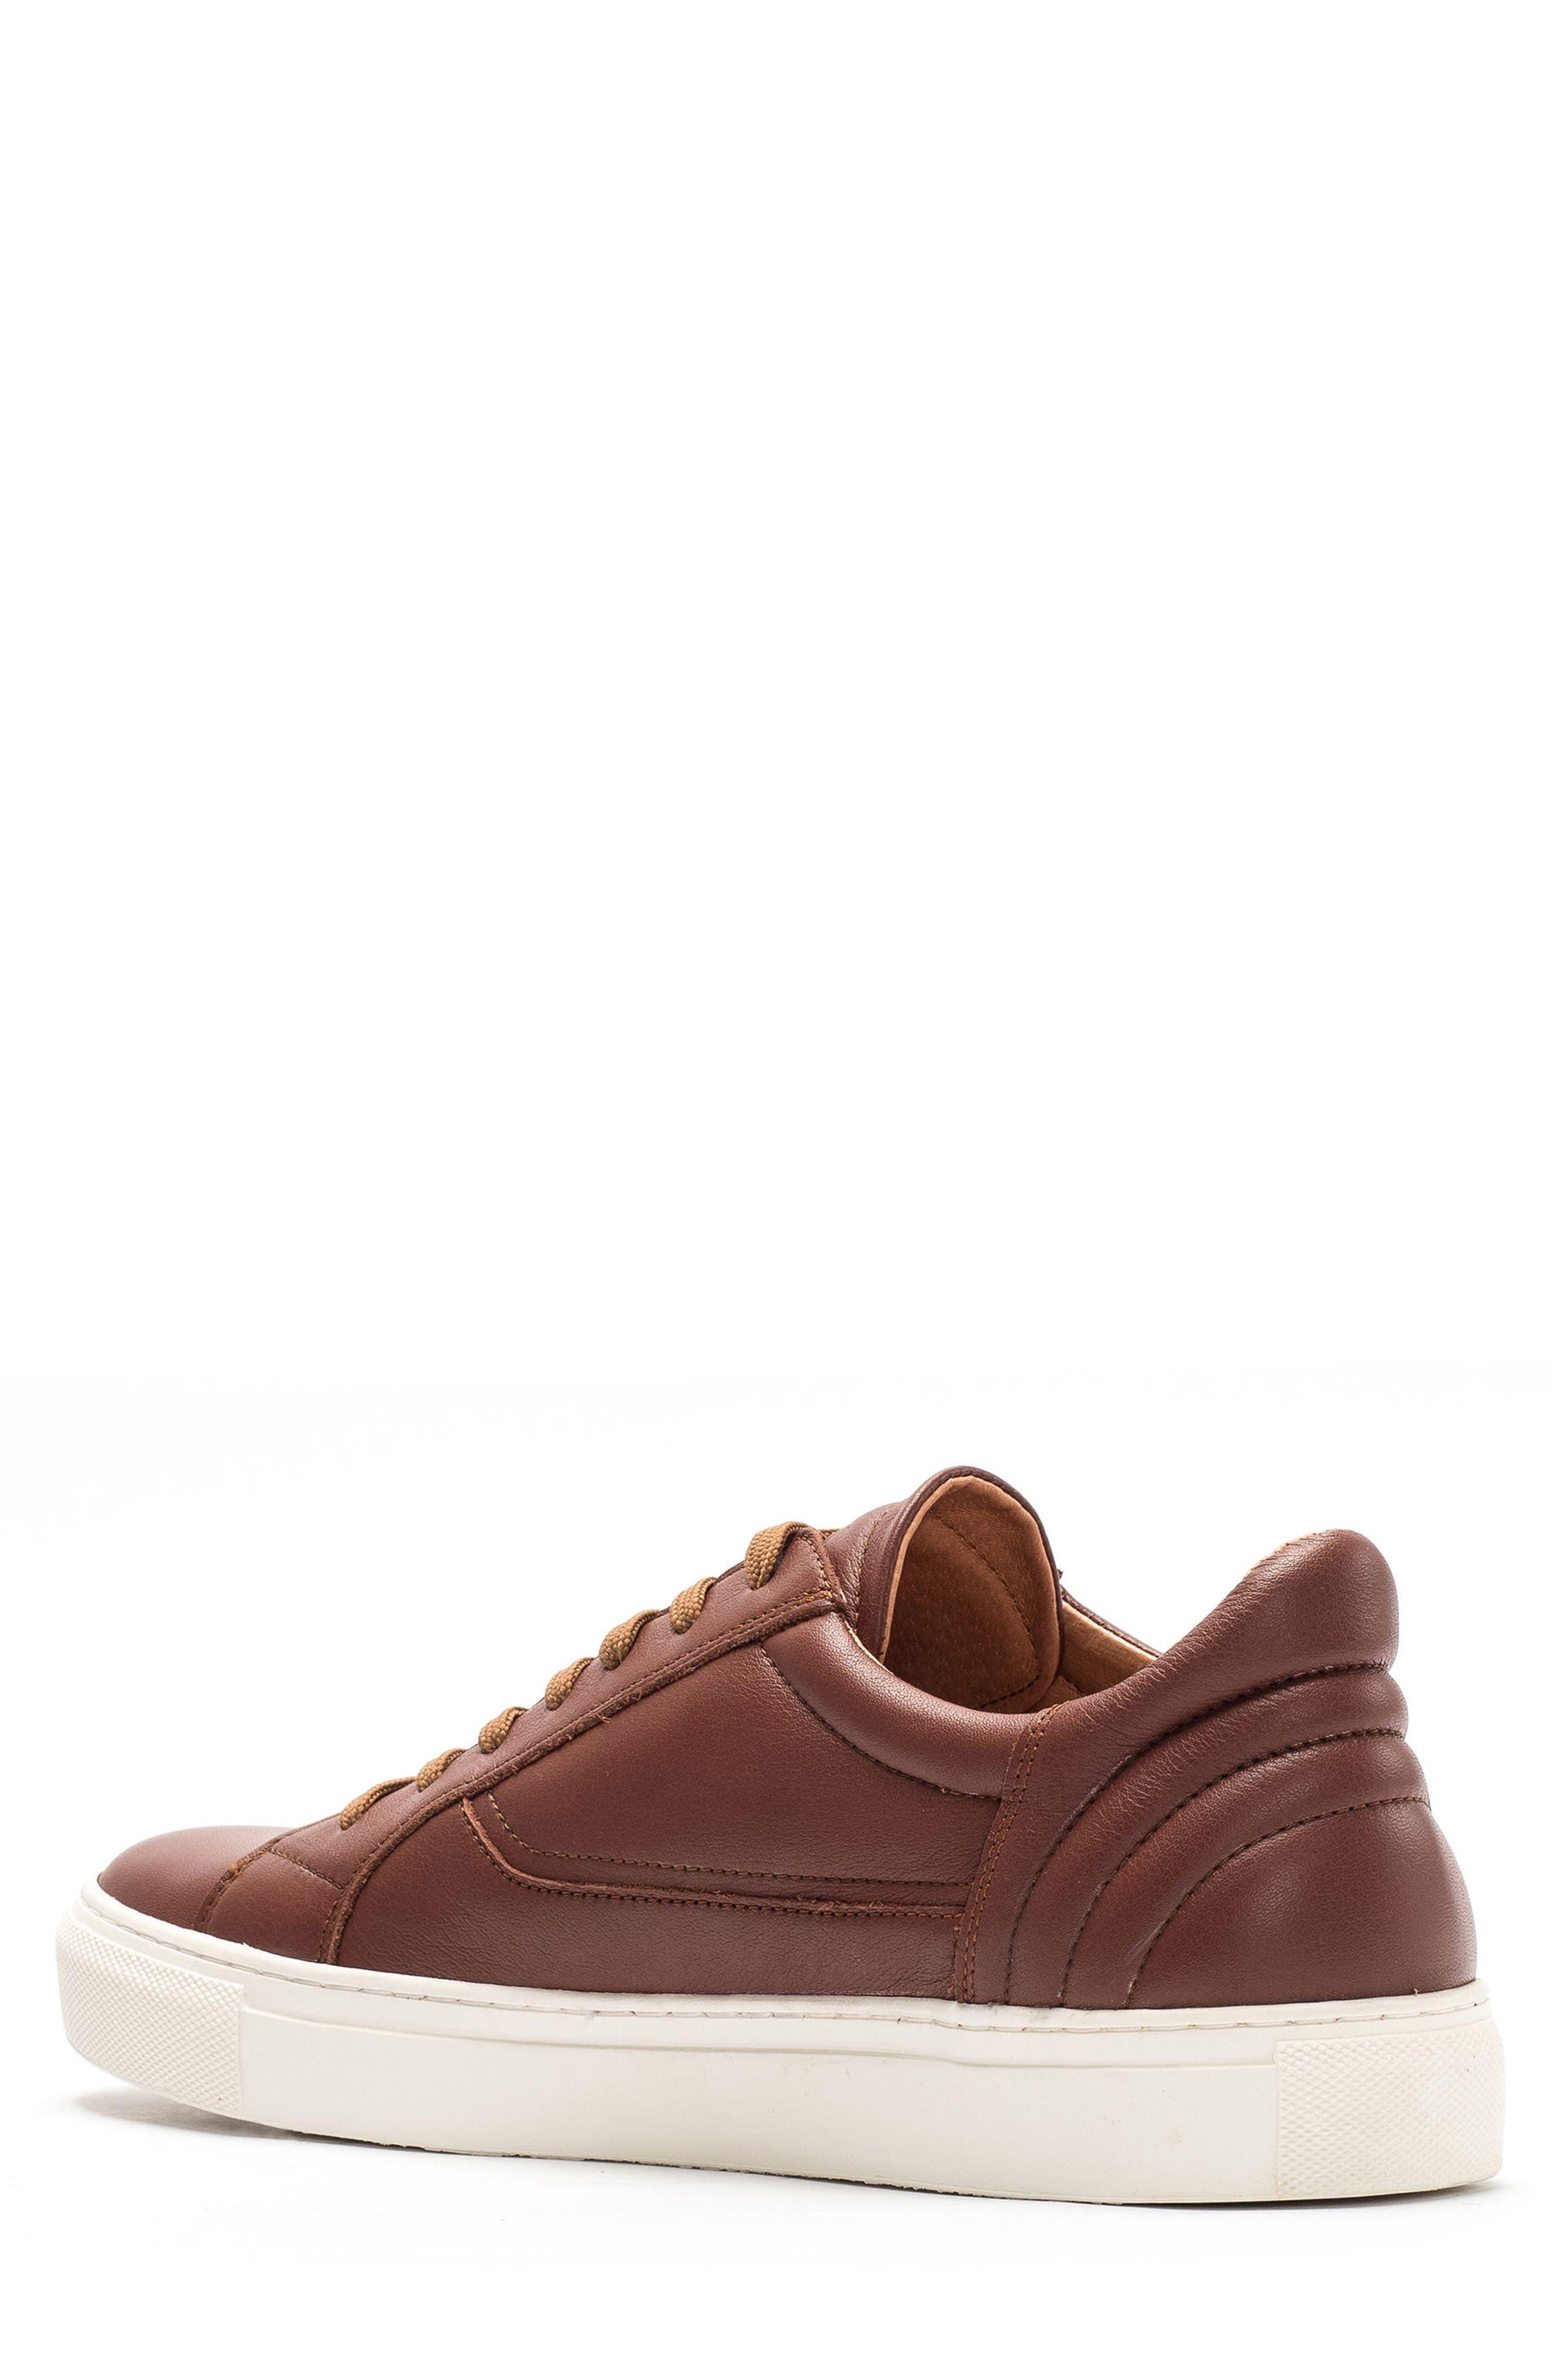 Shelton Road Sneaker,                             Alternate thumbnail 2, color,                             COFFEE